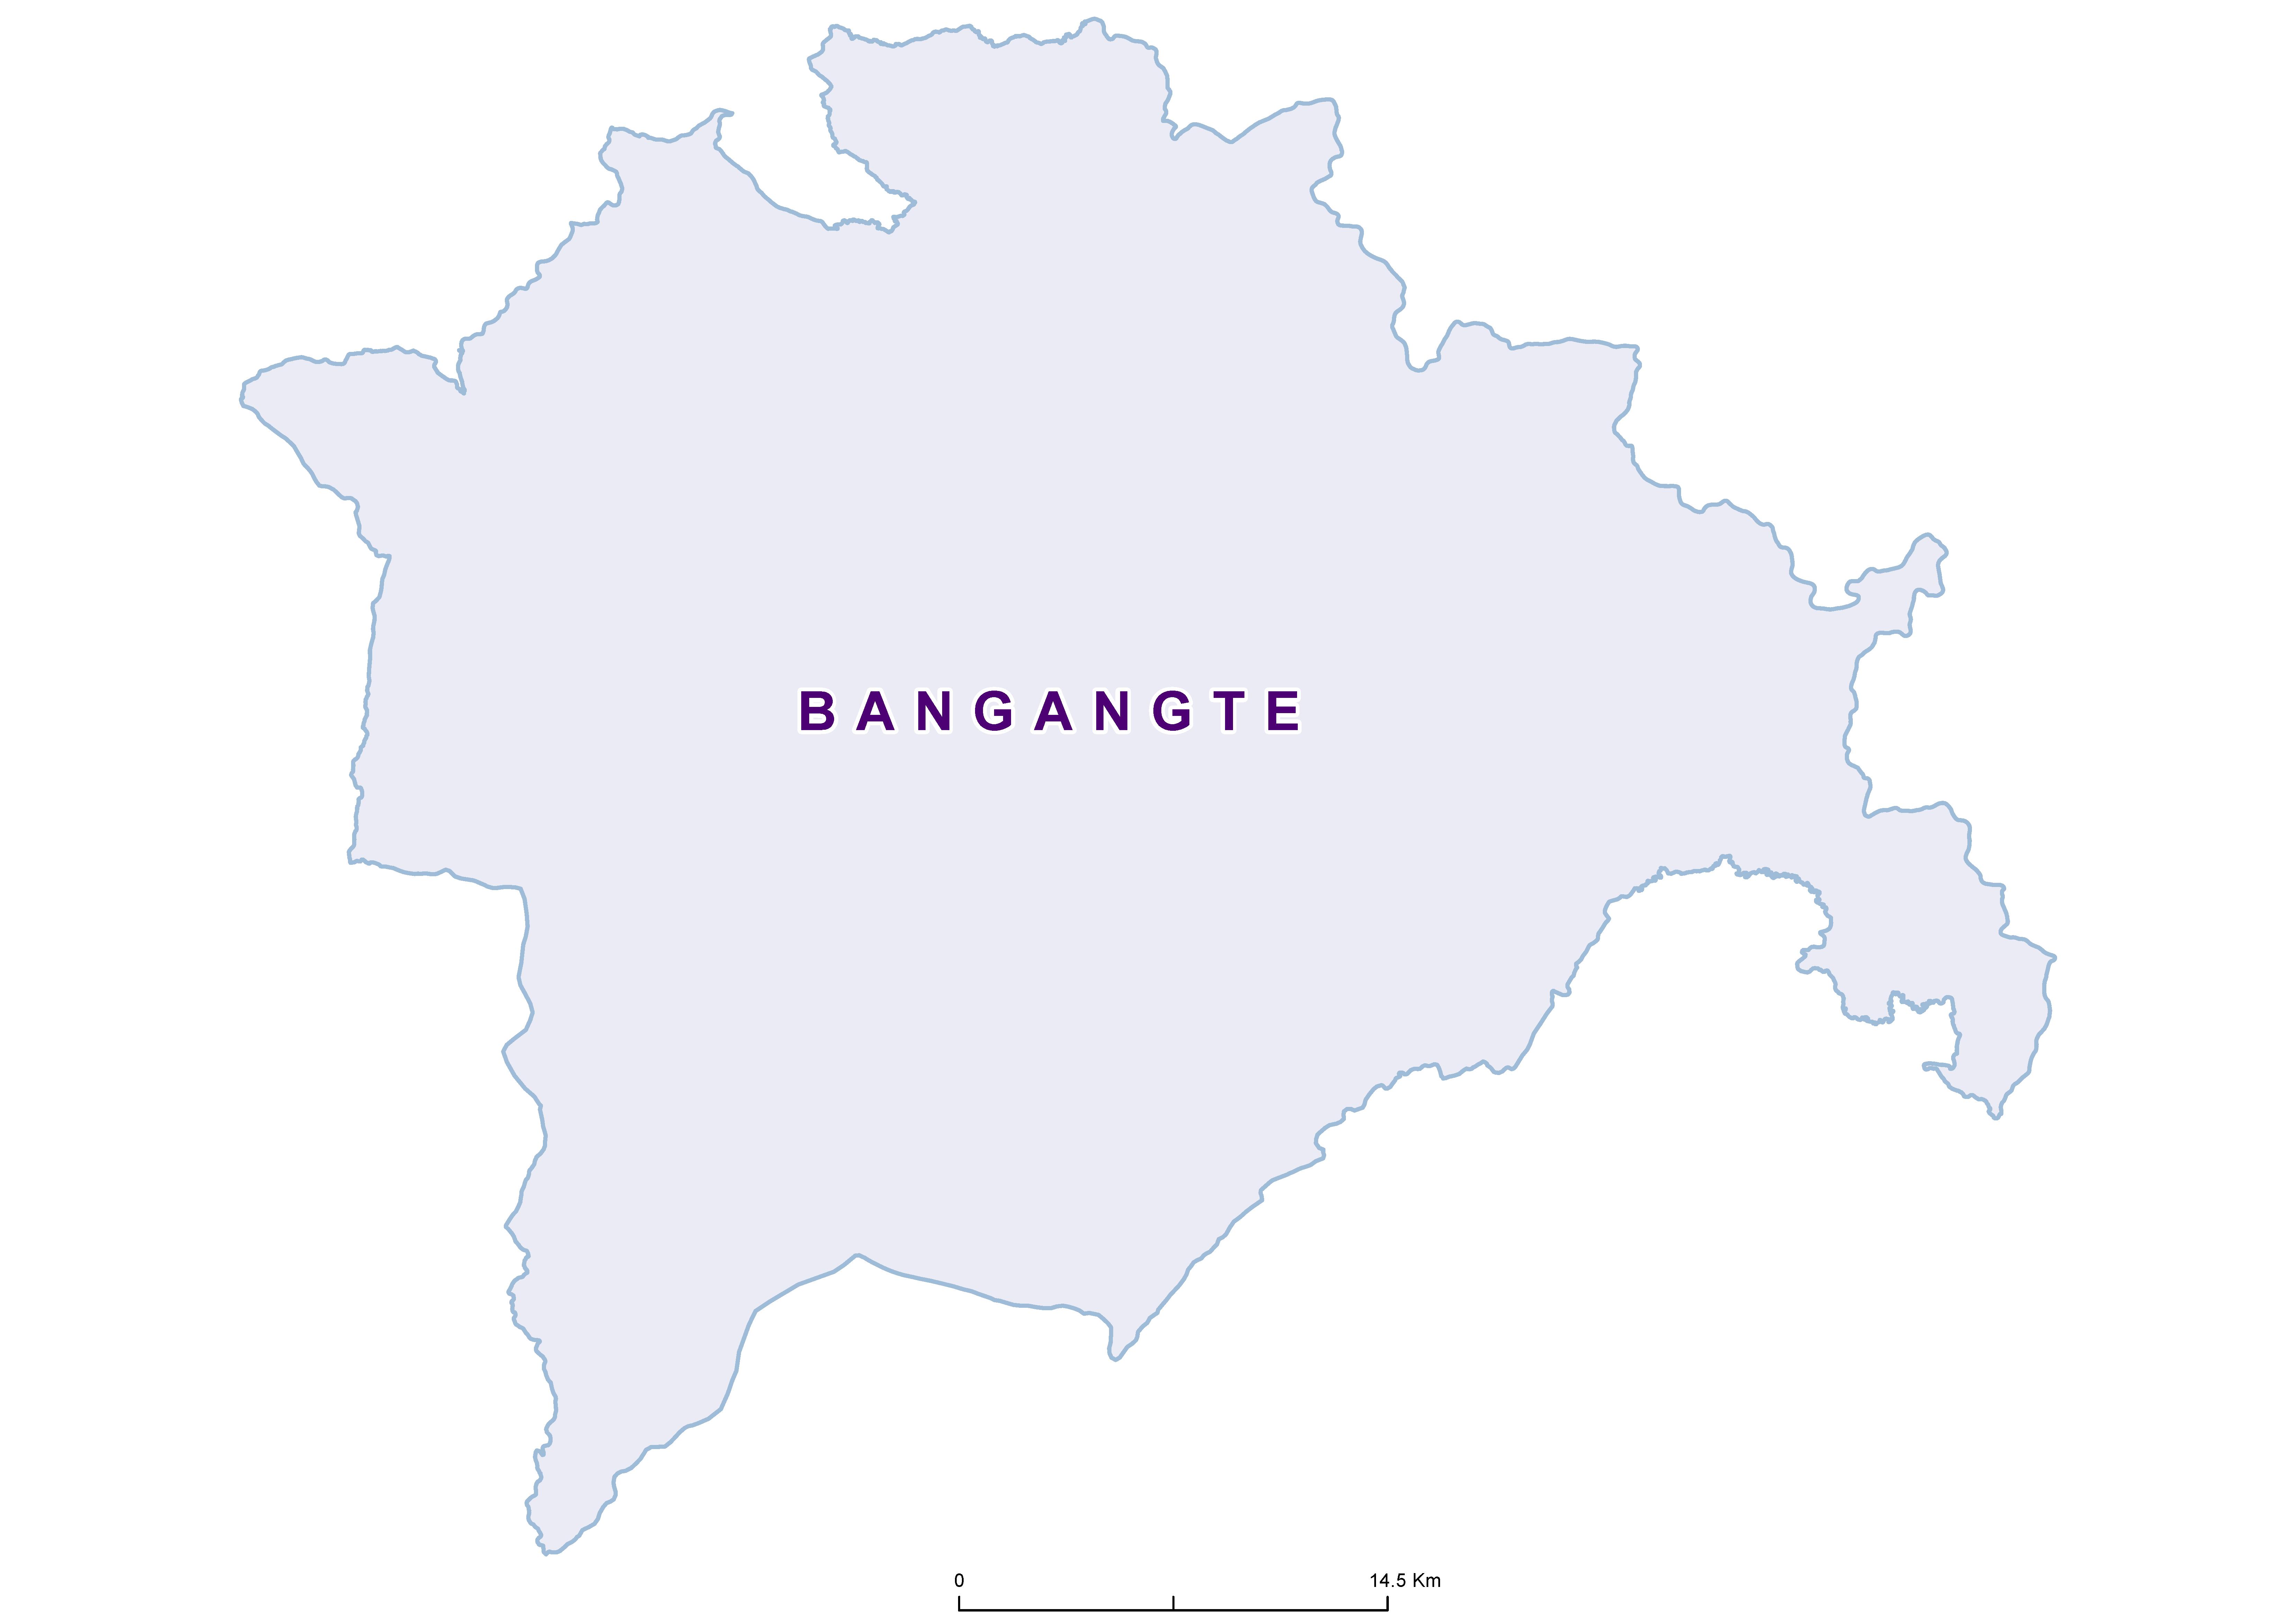 Bangangte Mean SCH 20180001